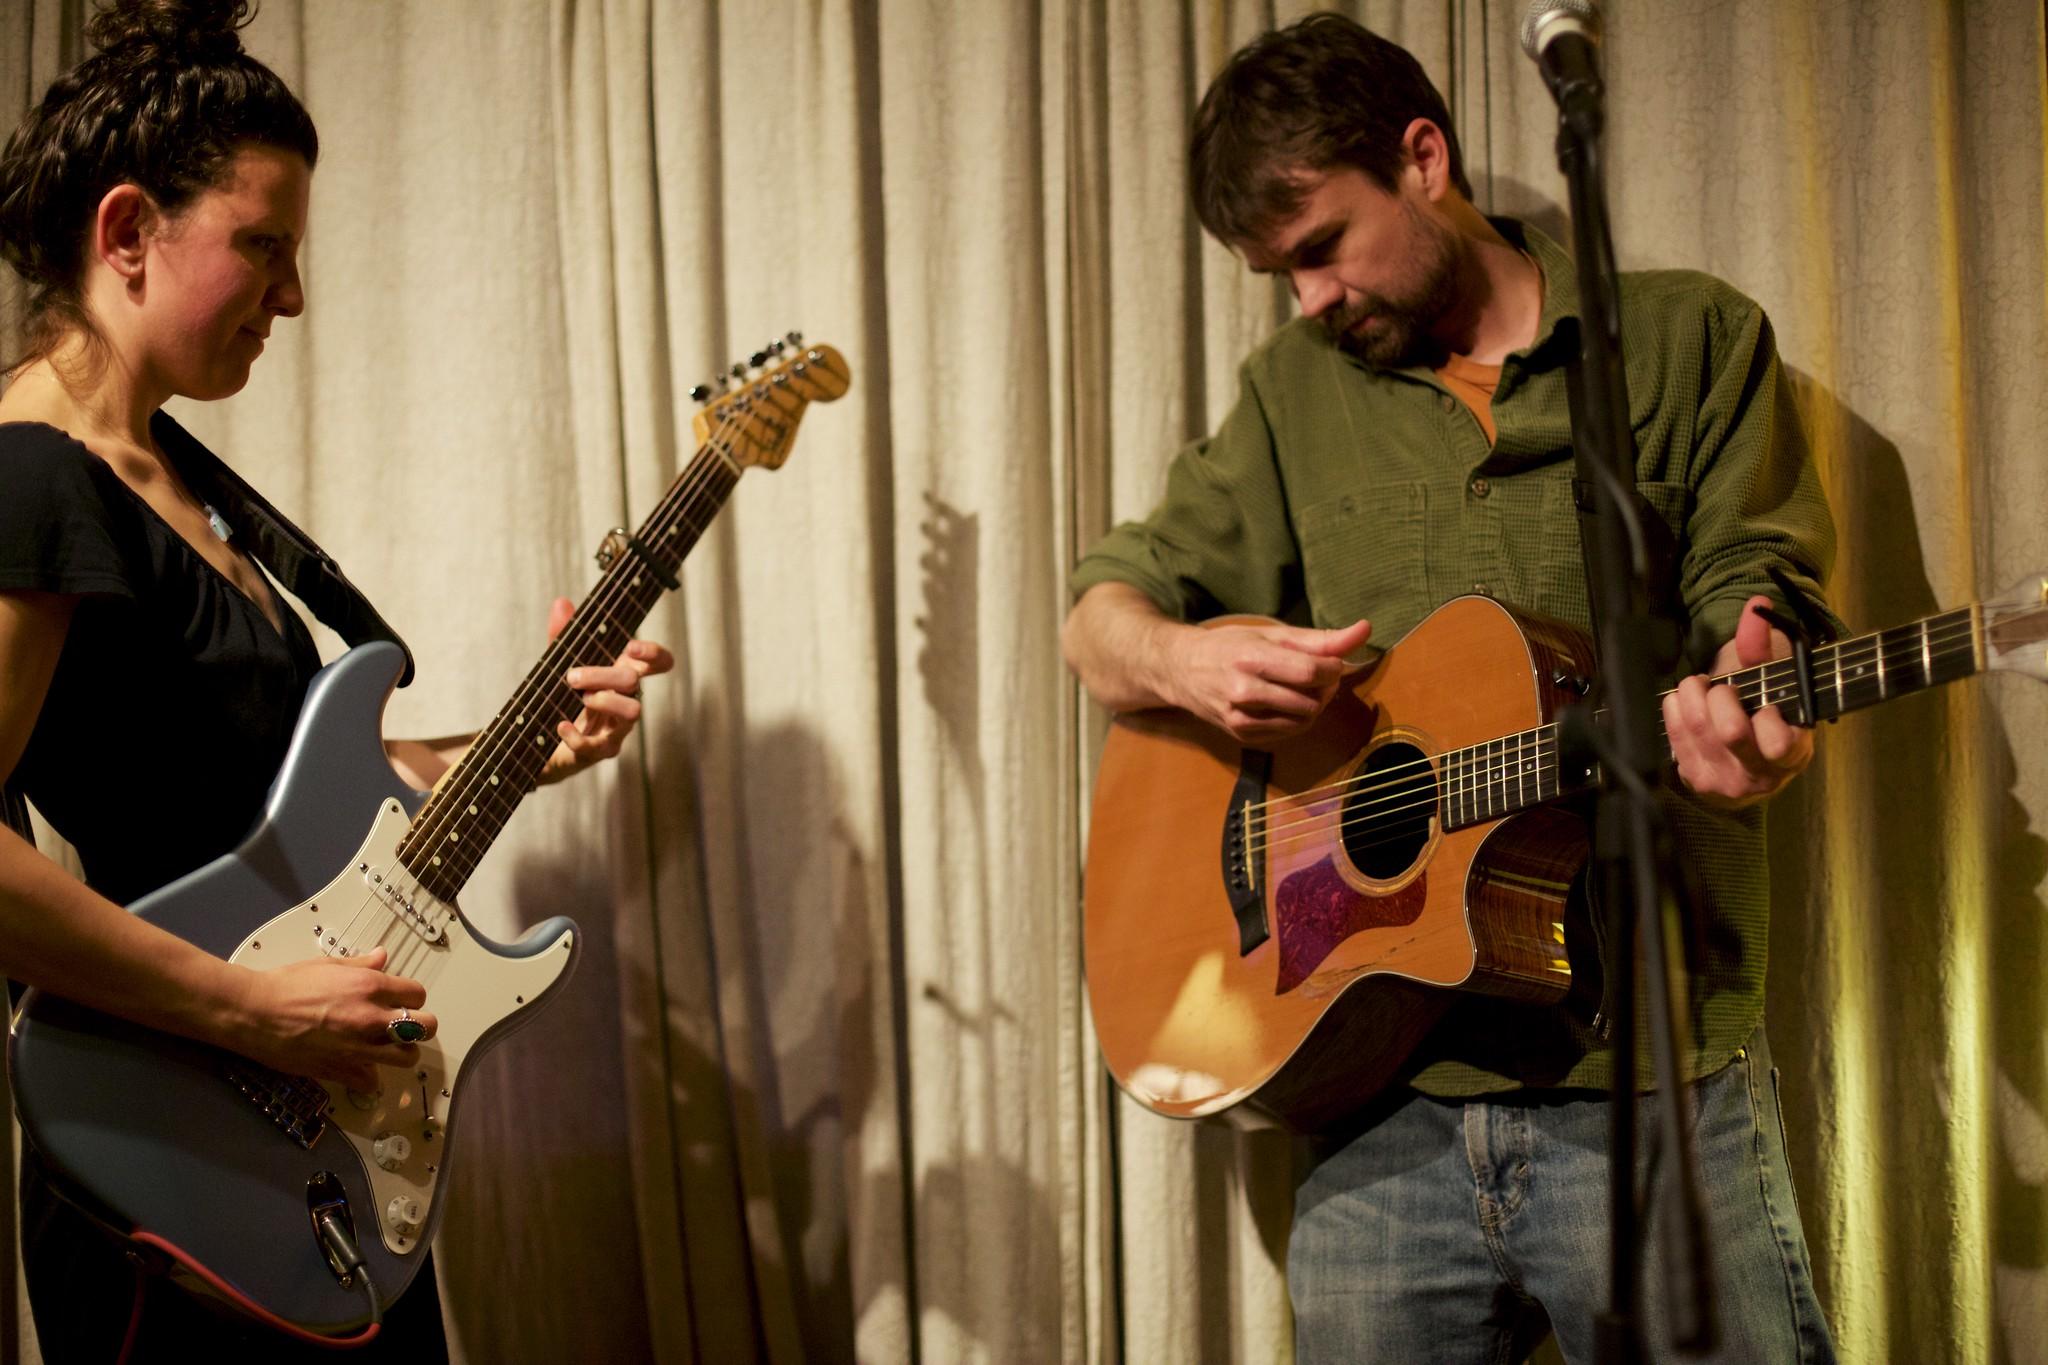 Dave McGraw & Mandy Fir at The Folkhouse | April 25, 2015